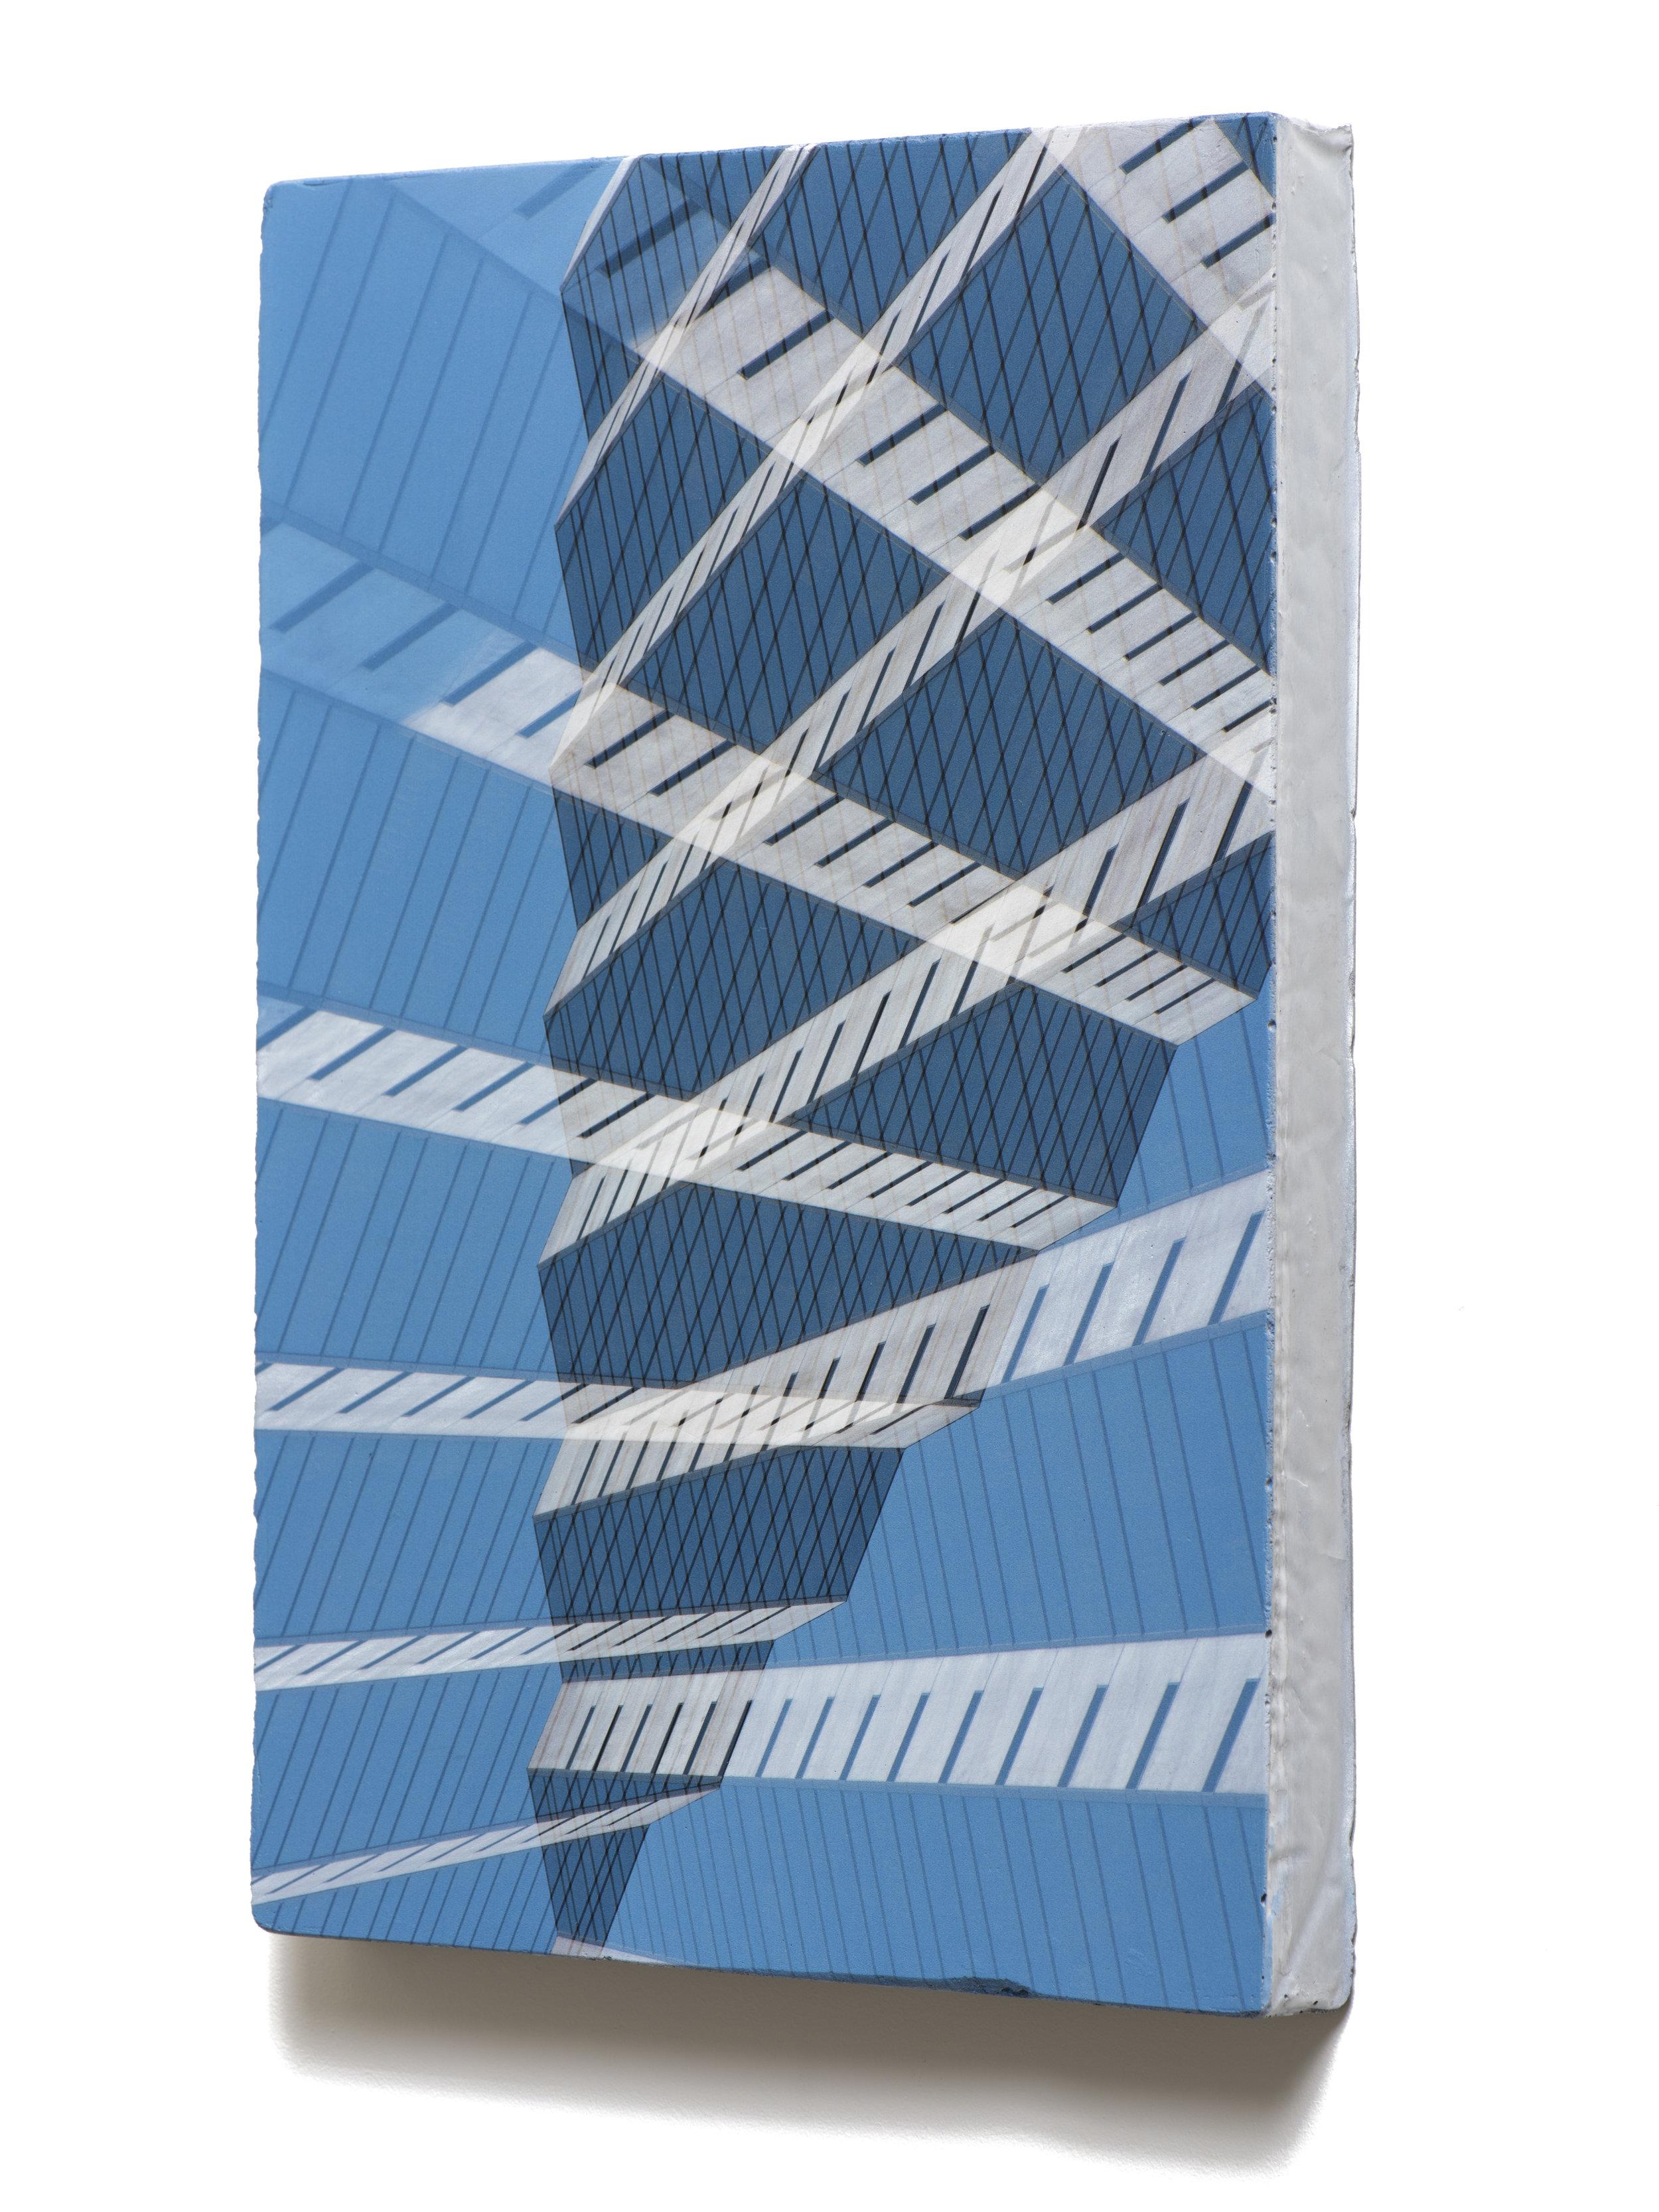 Counterform Pyramid , 2017 (oblique) UV ink on concrete 18 1/2 × 12 1/2 × 1 1/2 in Unique